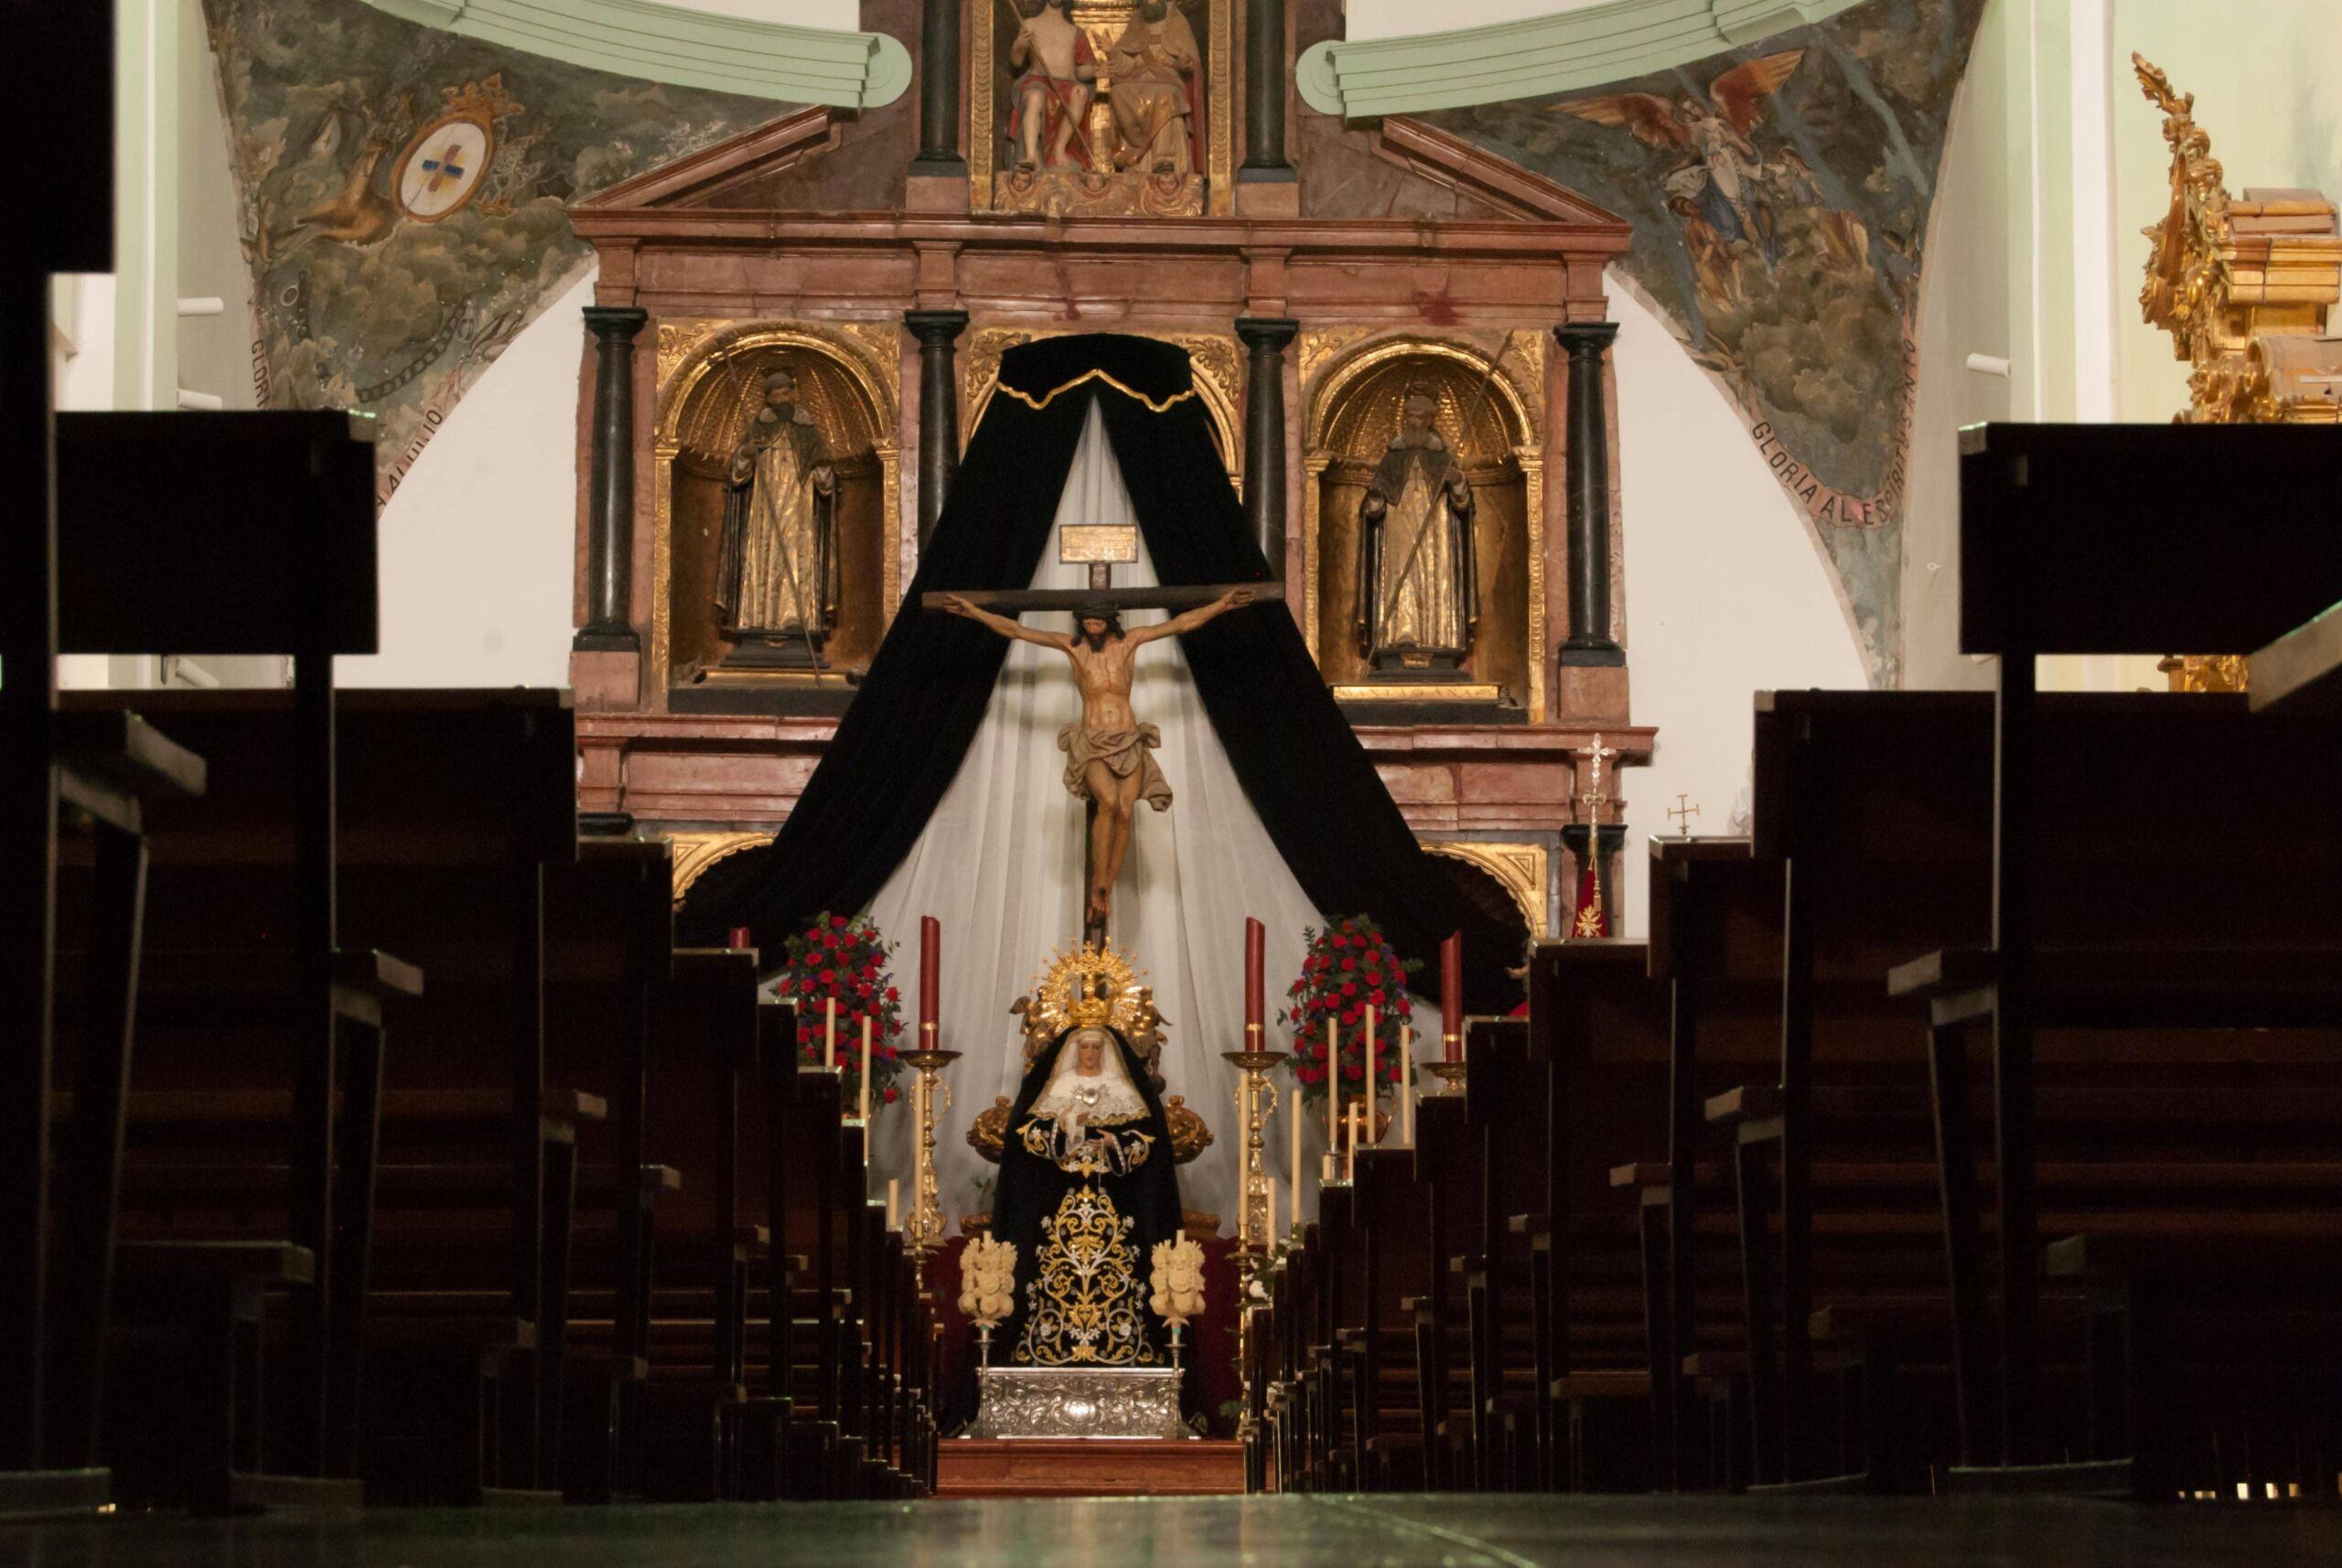 iglesia conventual de la stma trinidad la rambla